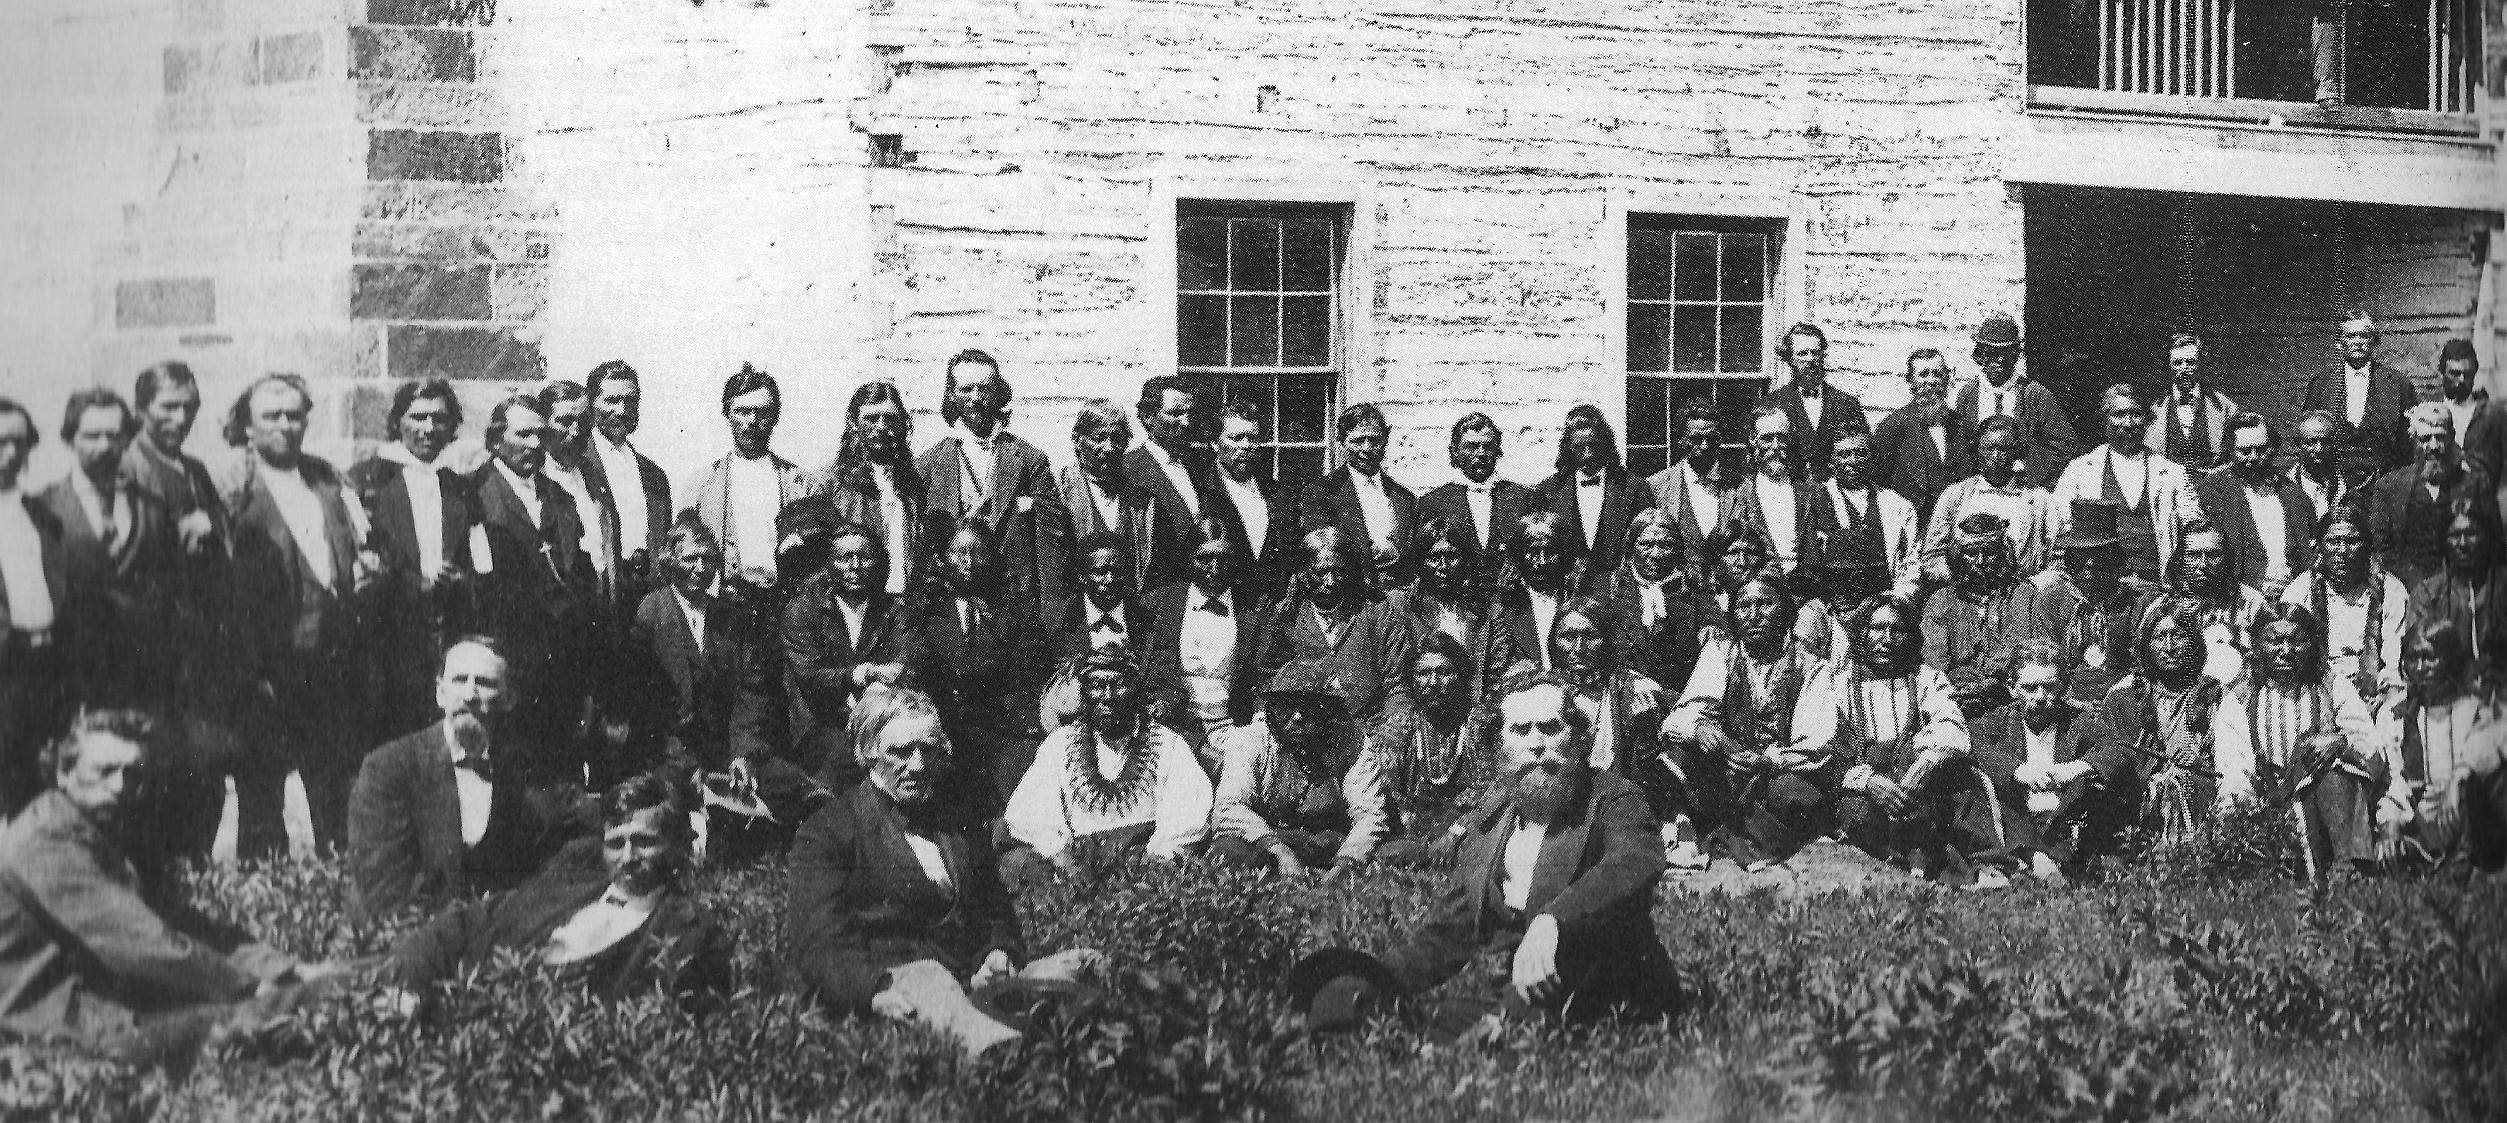 http://www.american-tribes.com/messageboards/dietmar/oklahoma-left.jpg